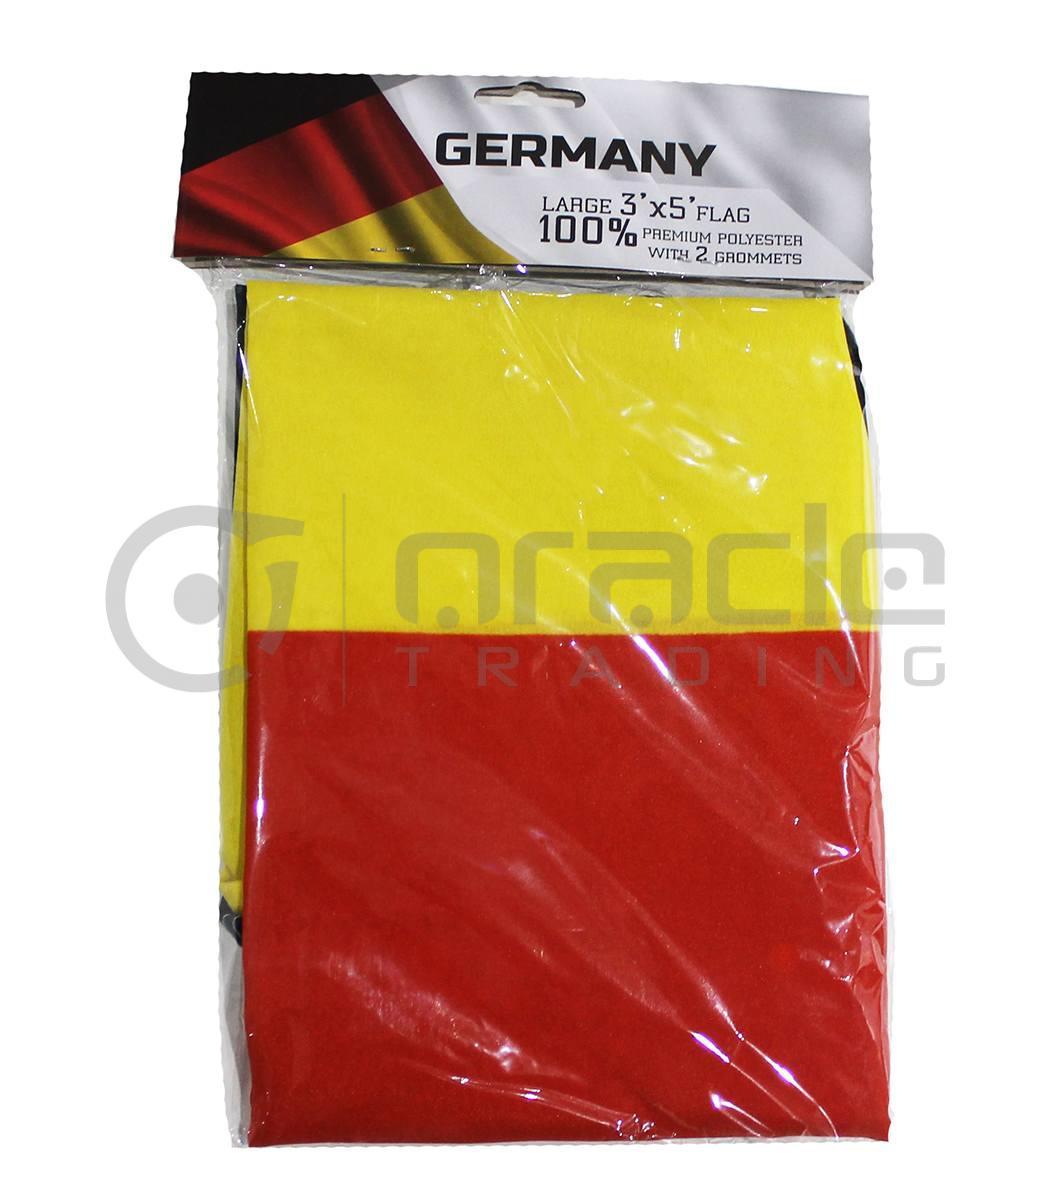 Large 3'x5' Germany Flag - Plain